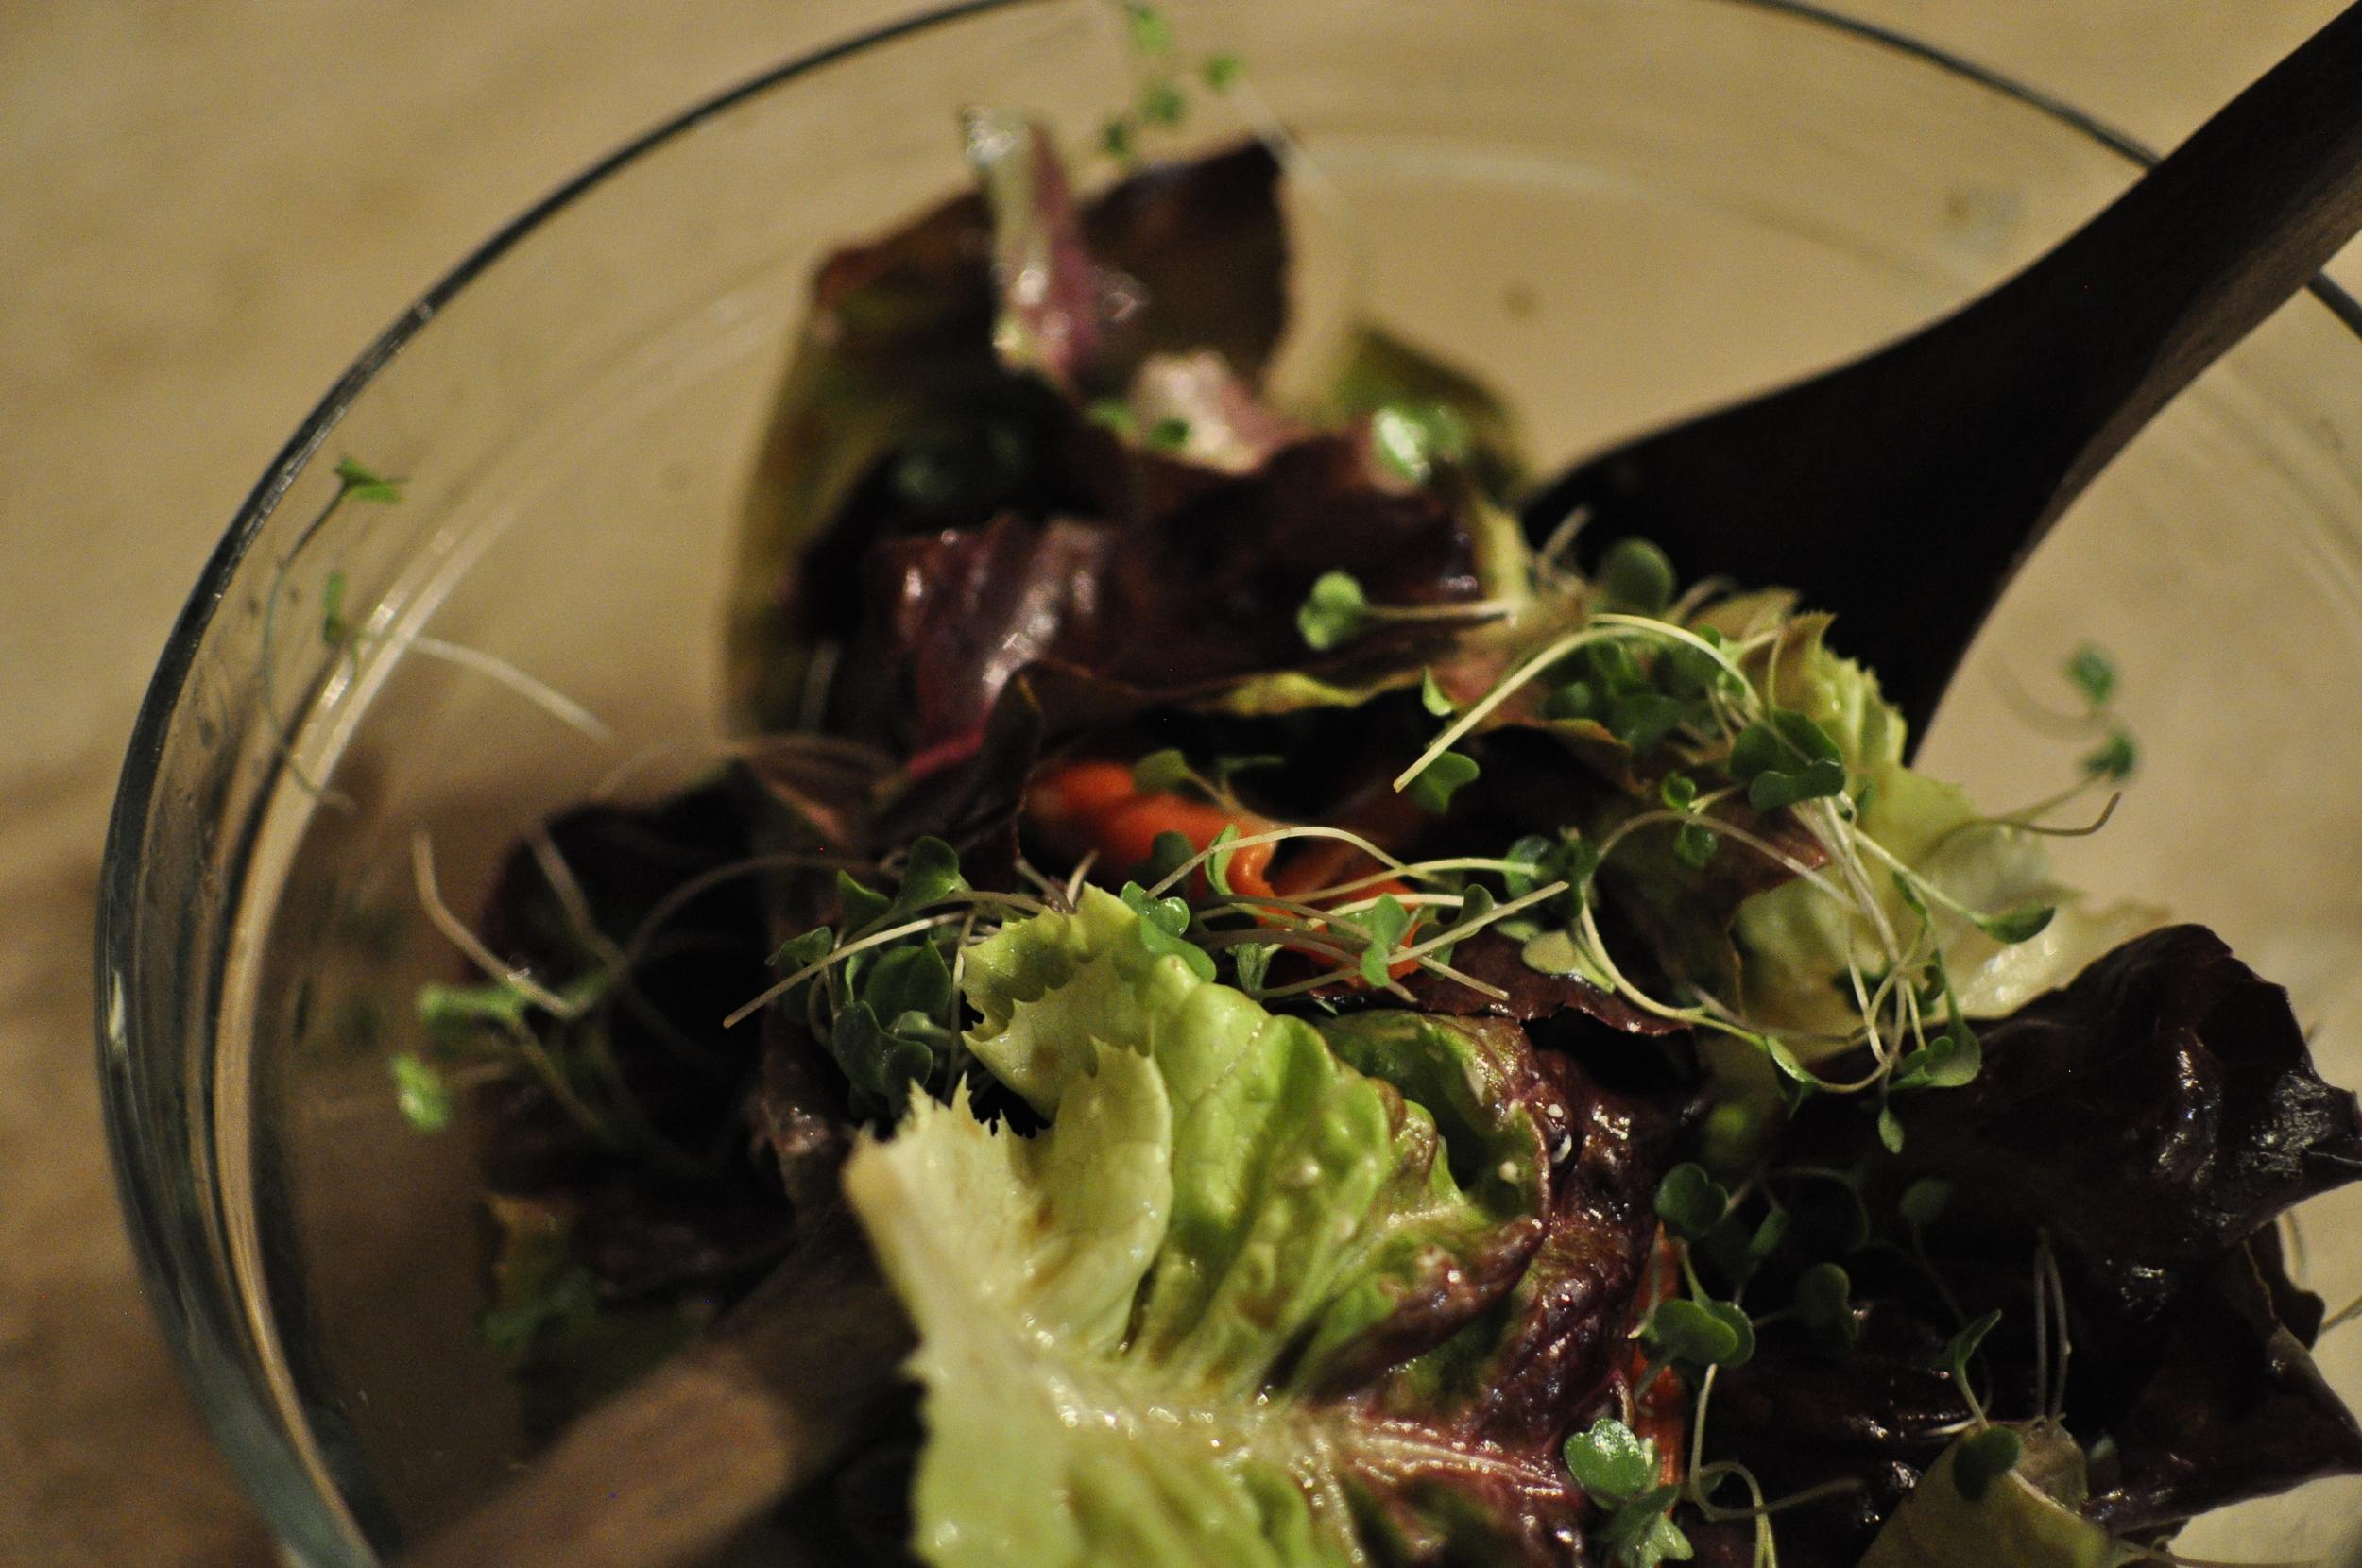 Microgreens mixed in a salad